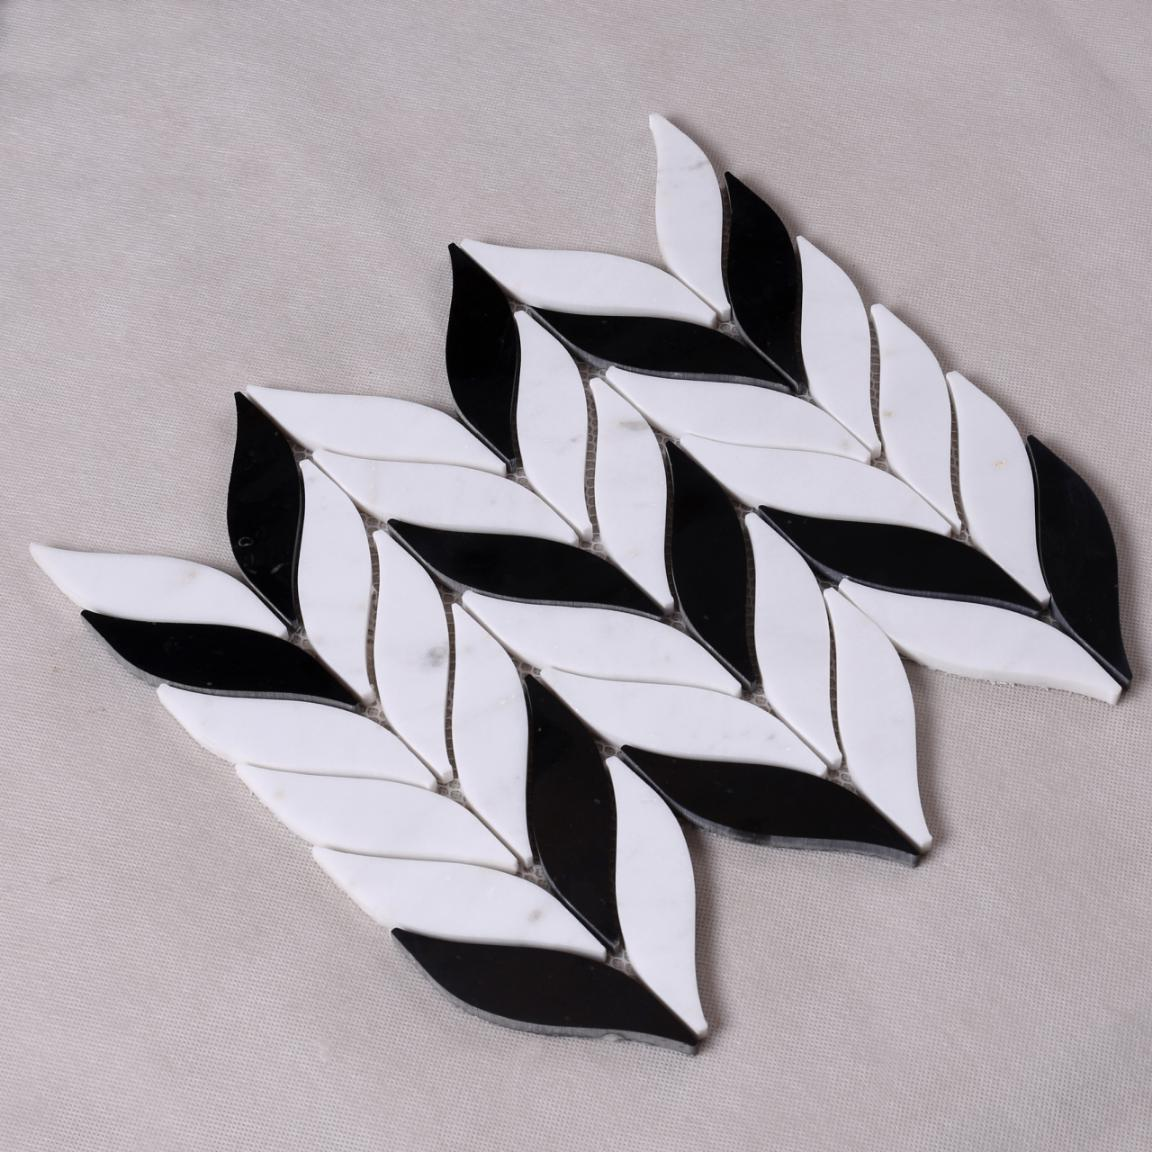 Heng Xing Custom glass stone mosaic manufacturers for bathroom-3